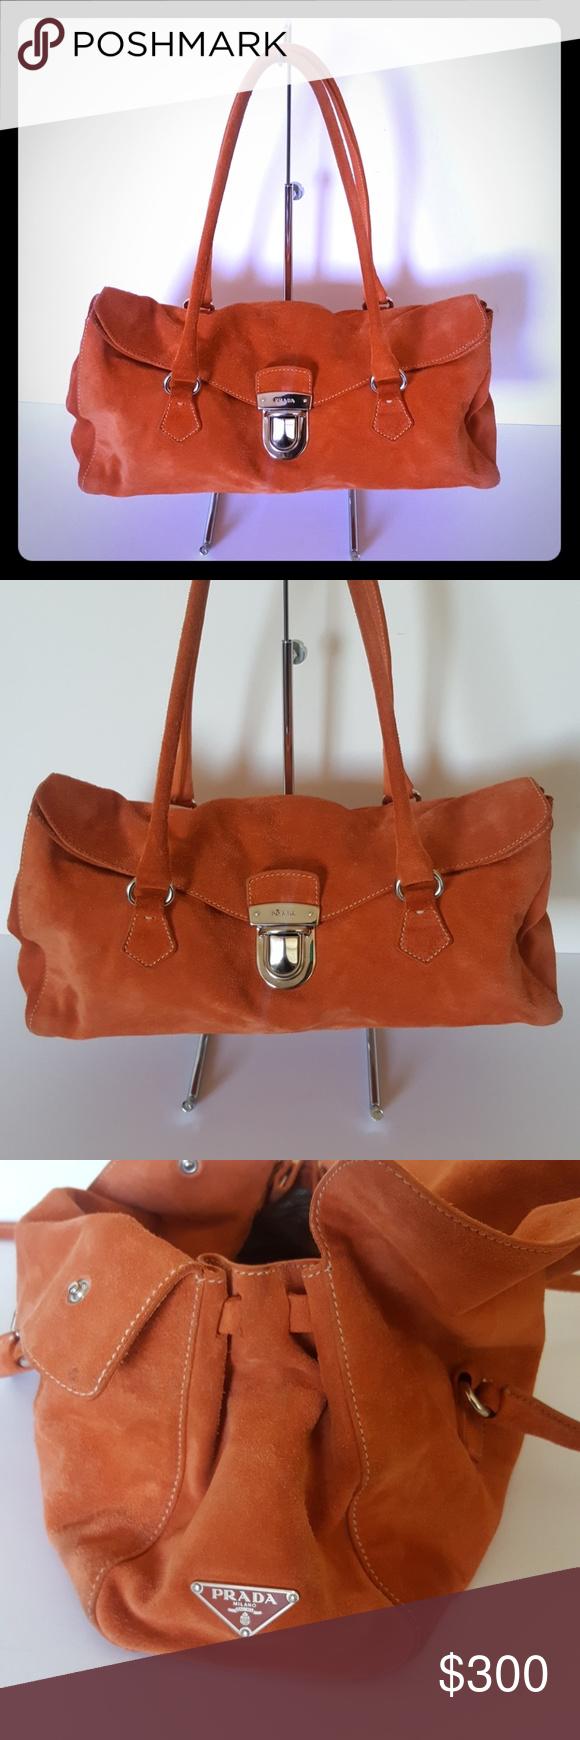 Prada Camoscio Easy Suede Bag Authentic Prada Mandarin Orange Suede Bag.  Beautiful bag that can be carried as a tote or shoulder bag. 05ad946f28